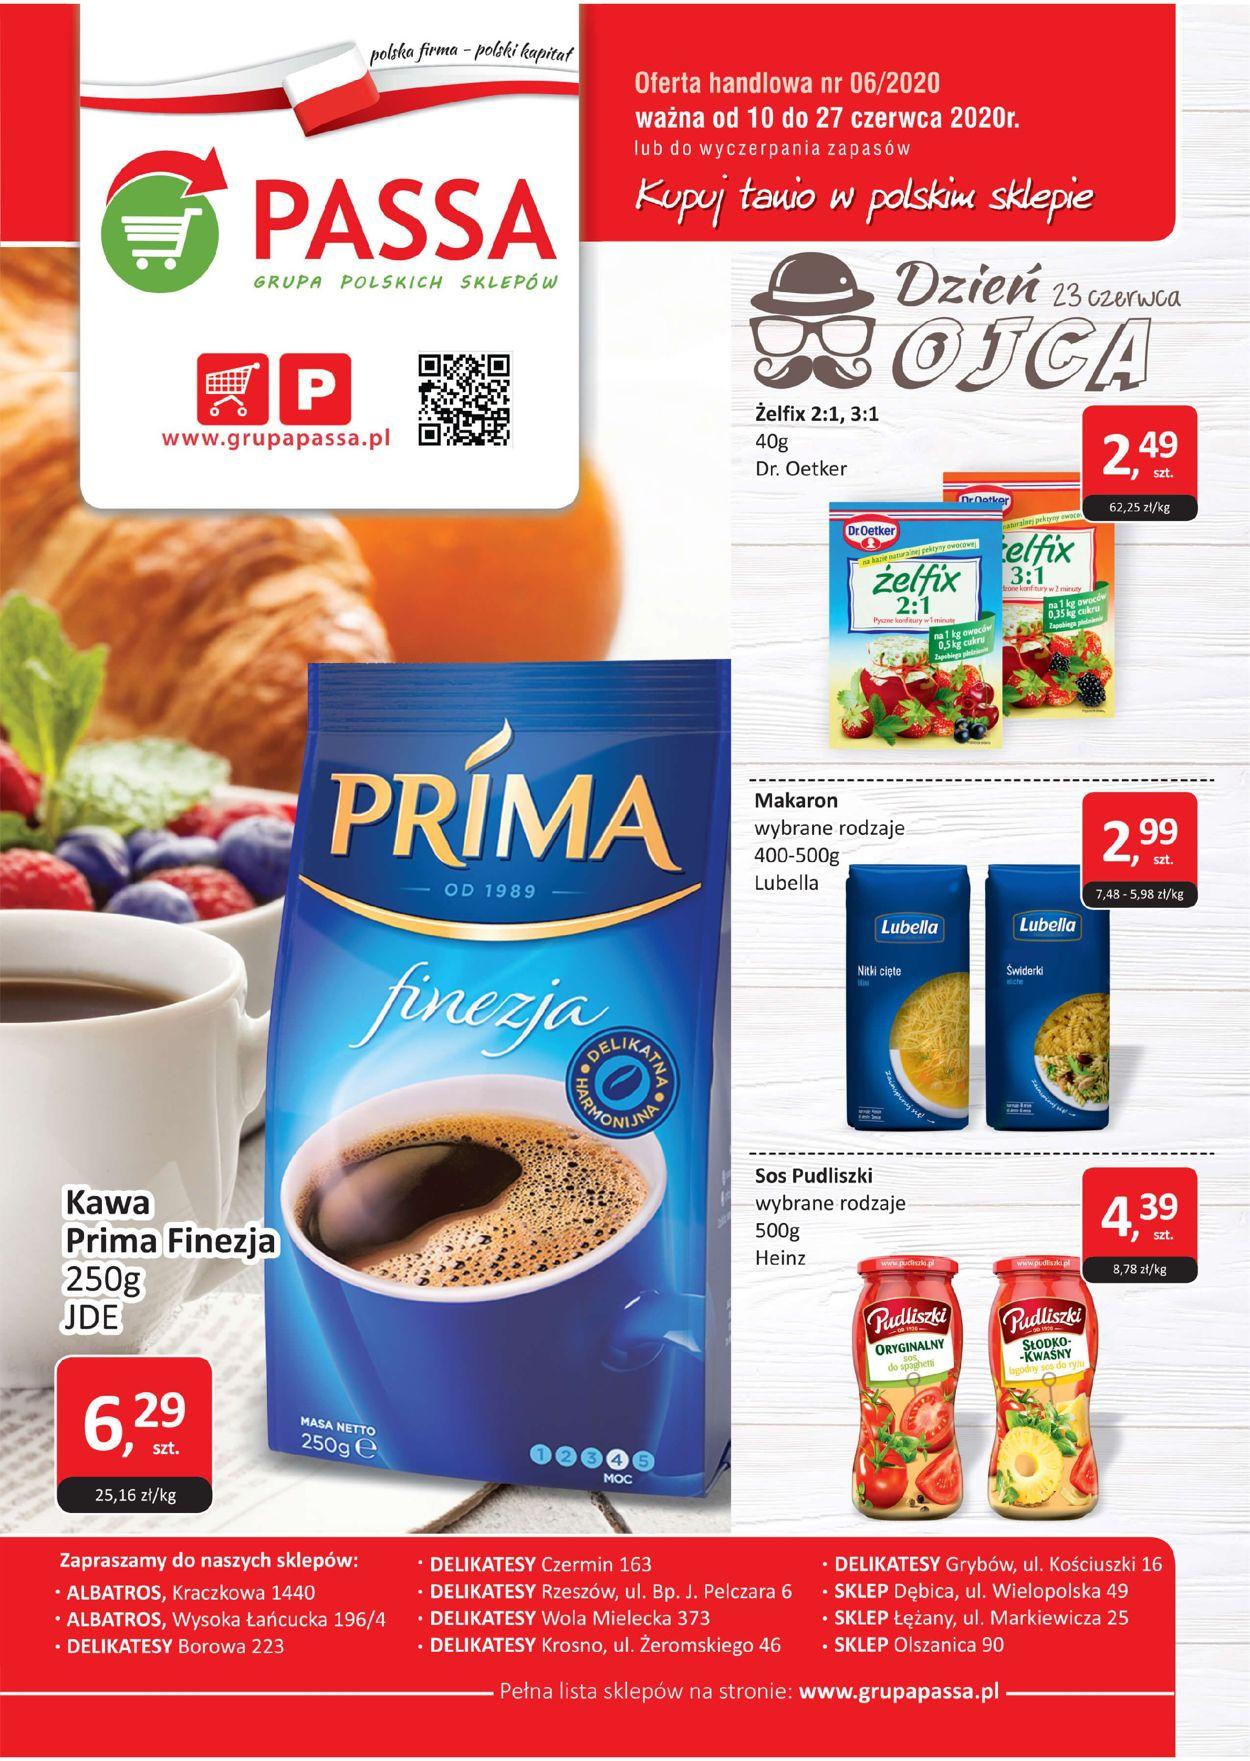 Gazetka promocyjna Passa - 10.06-27.06.2020